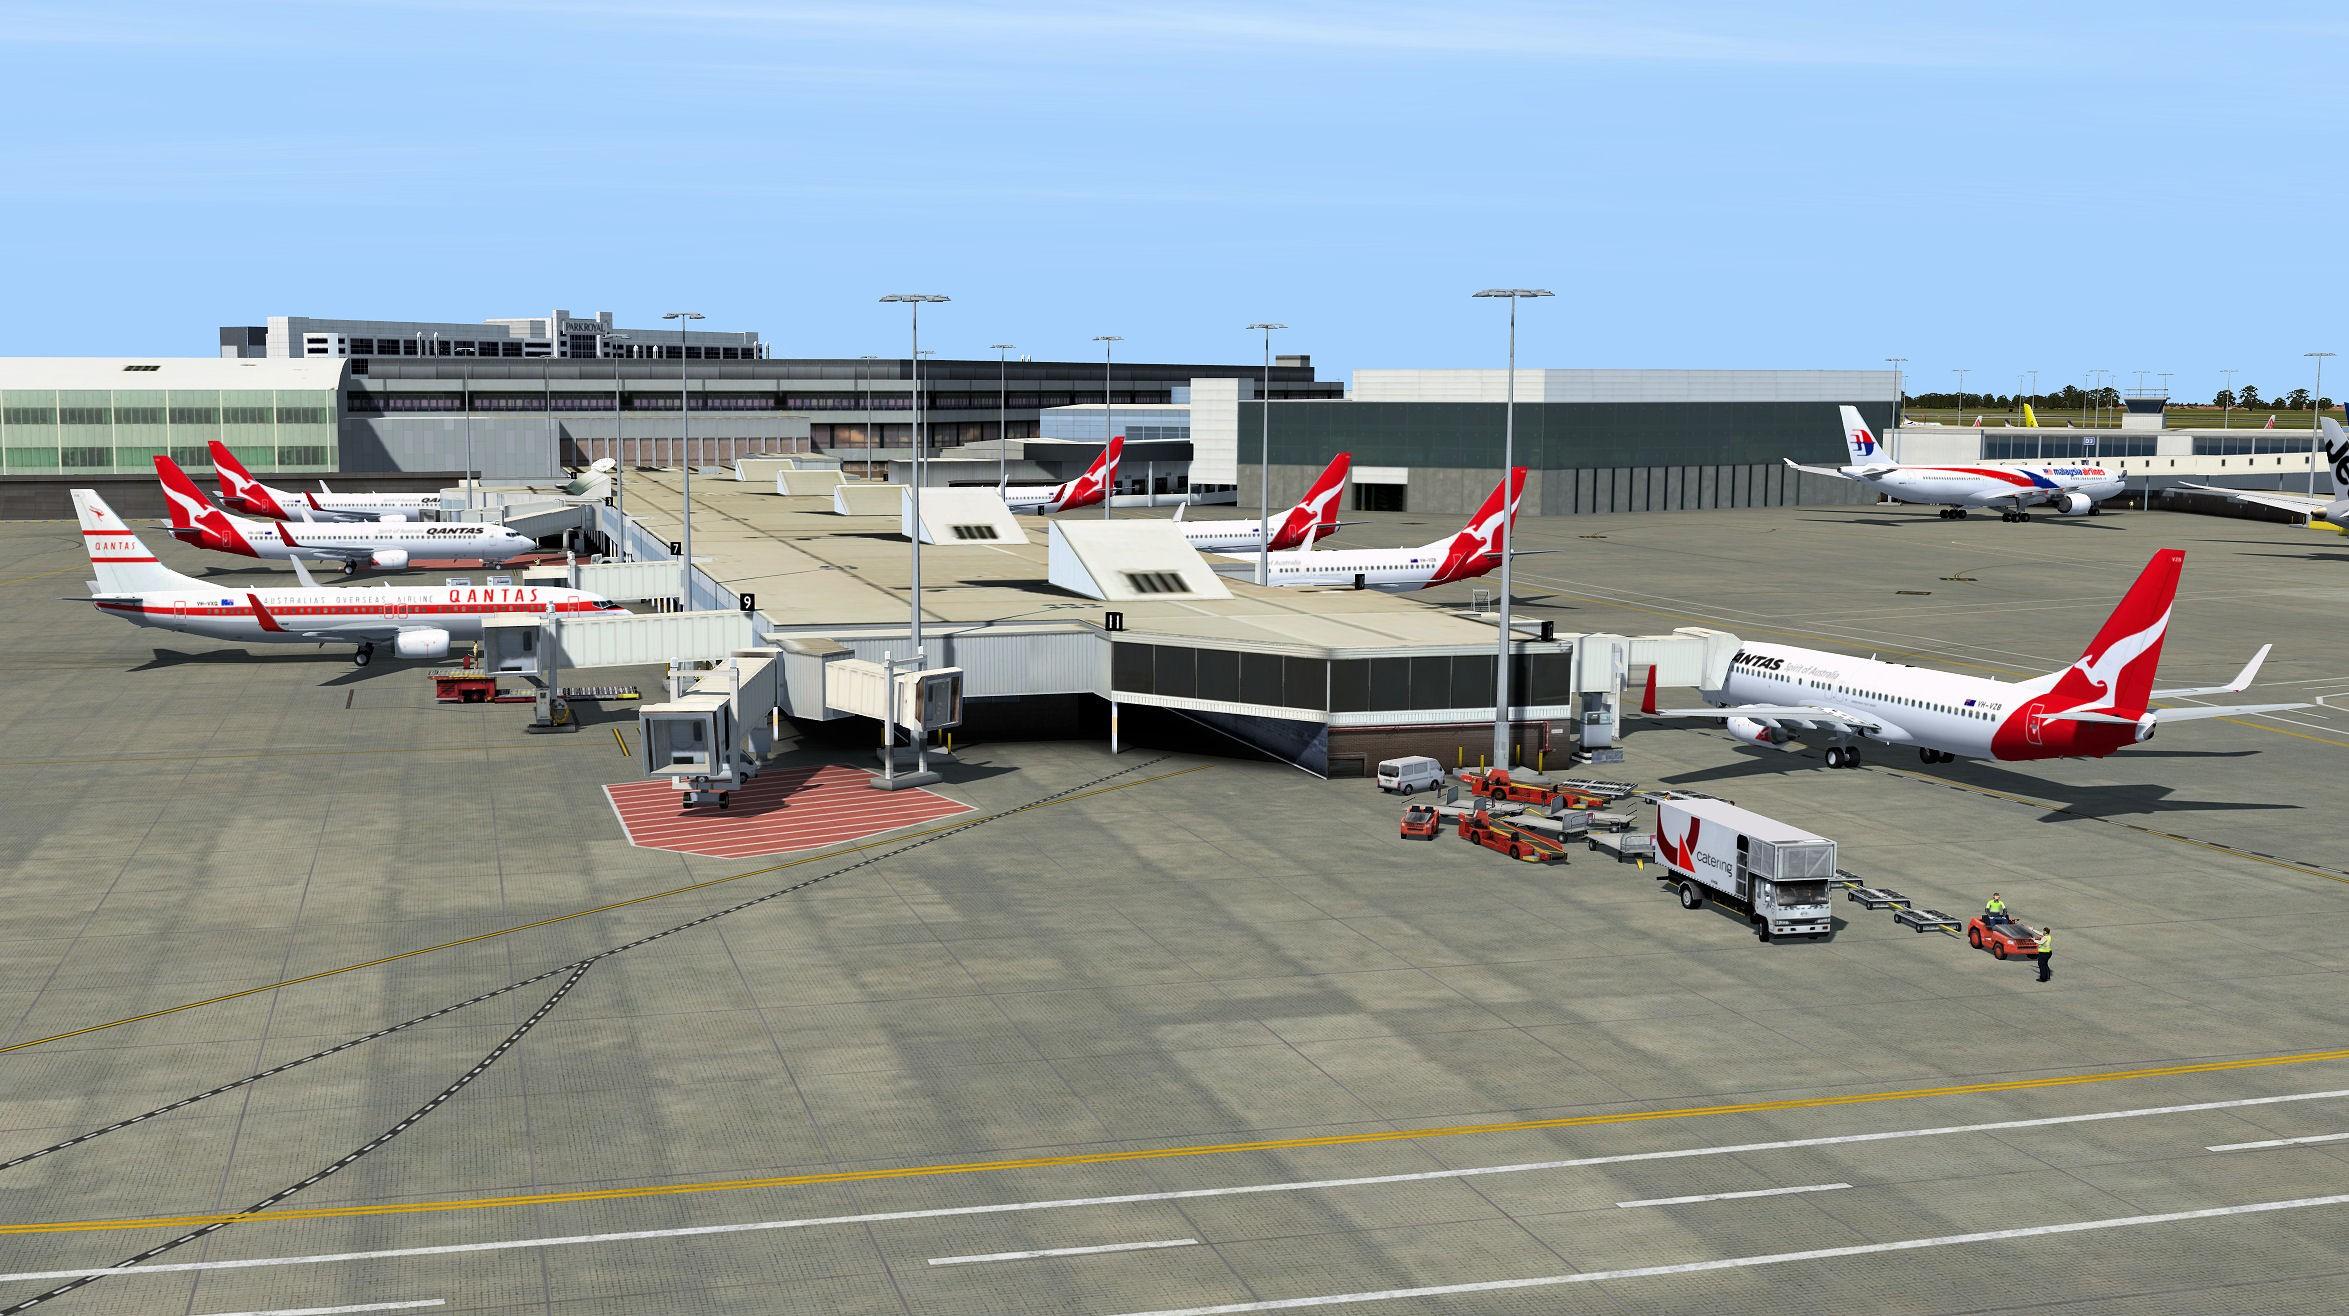 AI Traffic Australia and New Zealand P3Dv4 - Orbx